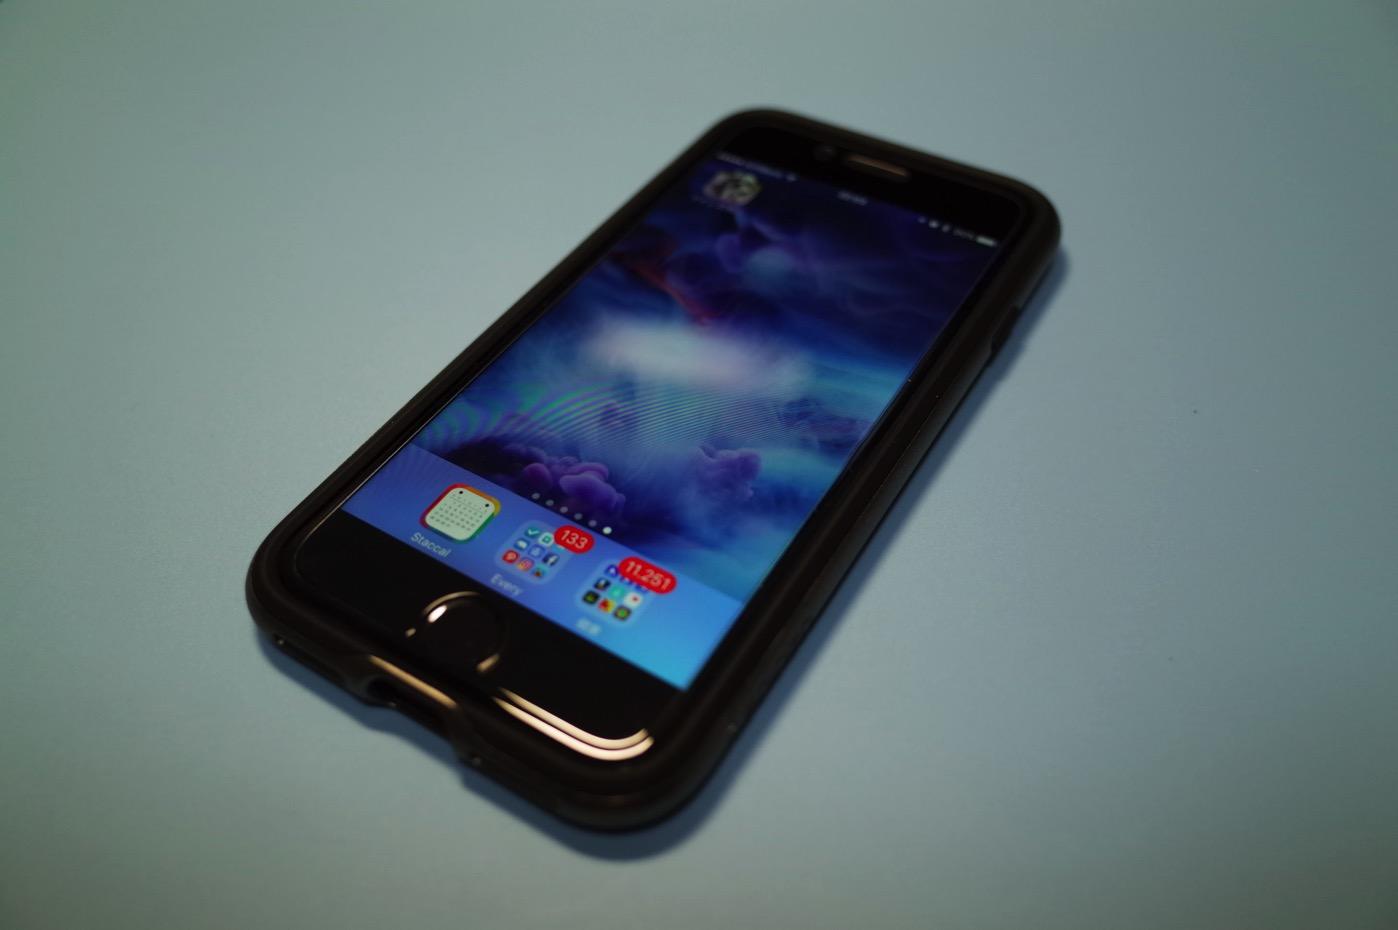 iPhoneケース「ネオ・ハイブリッド米軍MIL規格取得 二重構造バンパー」